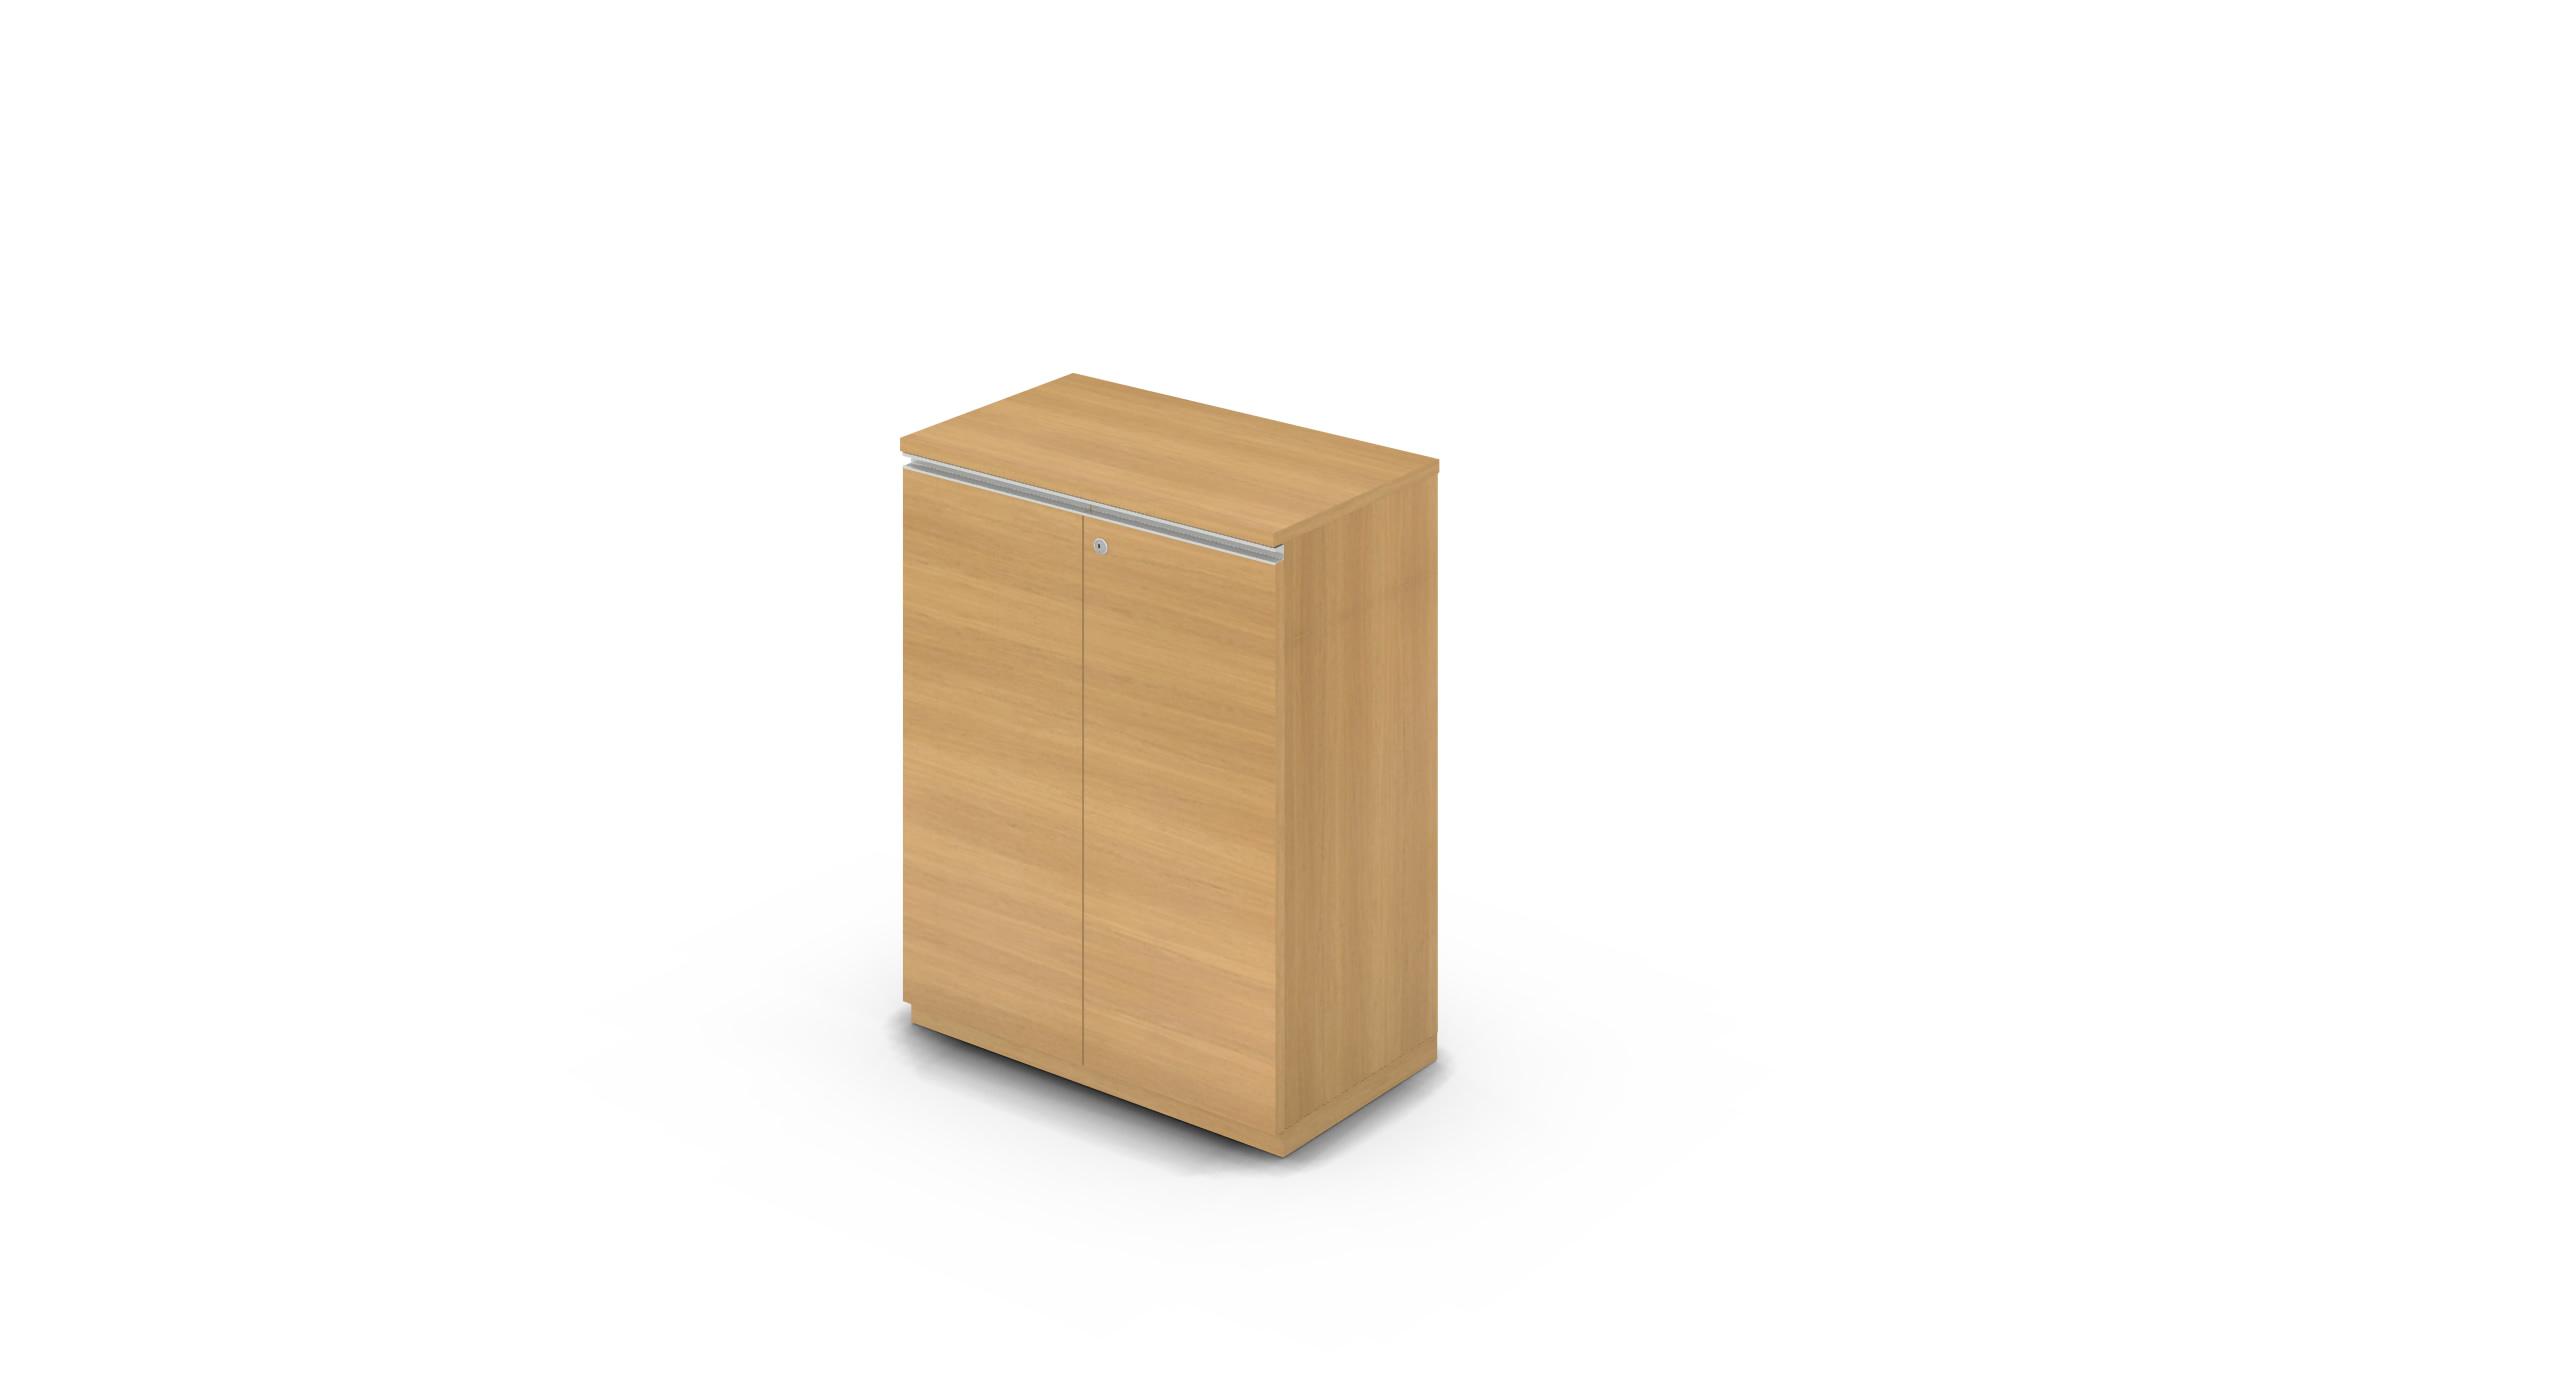 Cabinet_800x450x1125_HD_Oak_Rail_WithCylinder